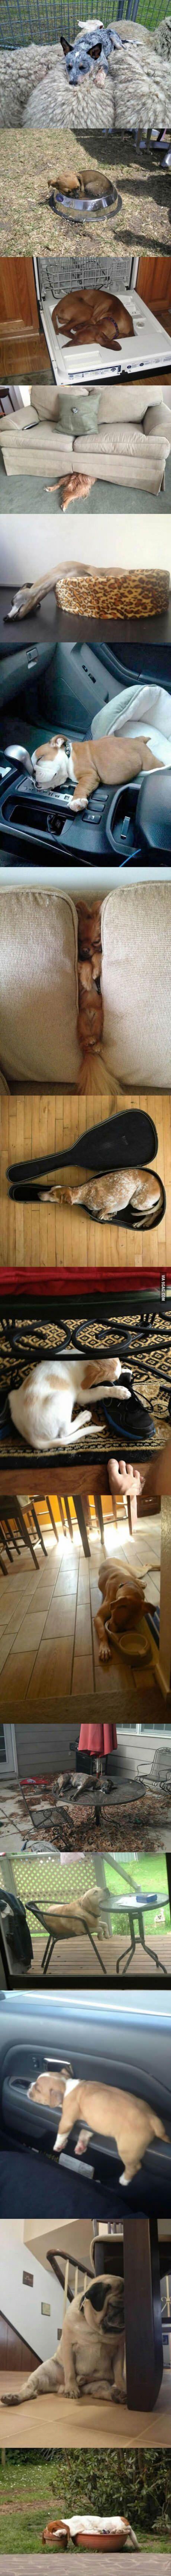 15 photos that prove dogs can fell asleep anywhere.